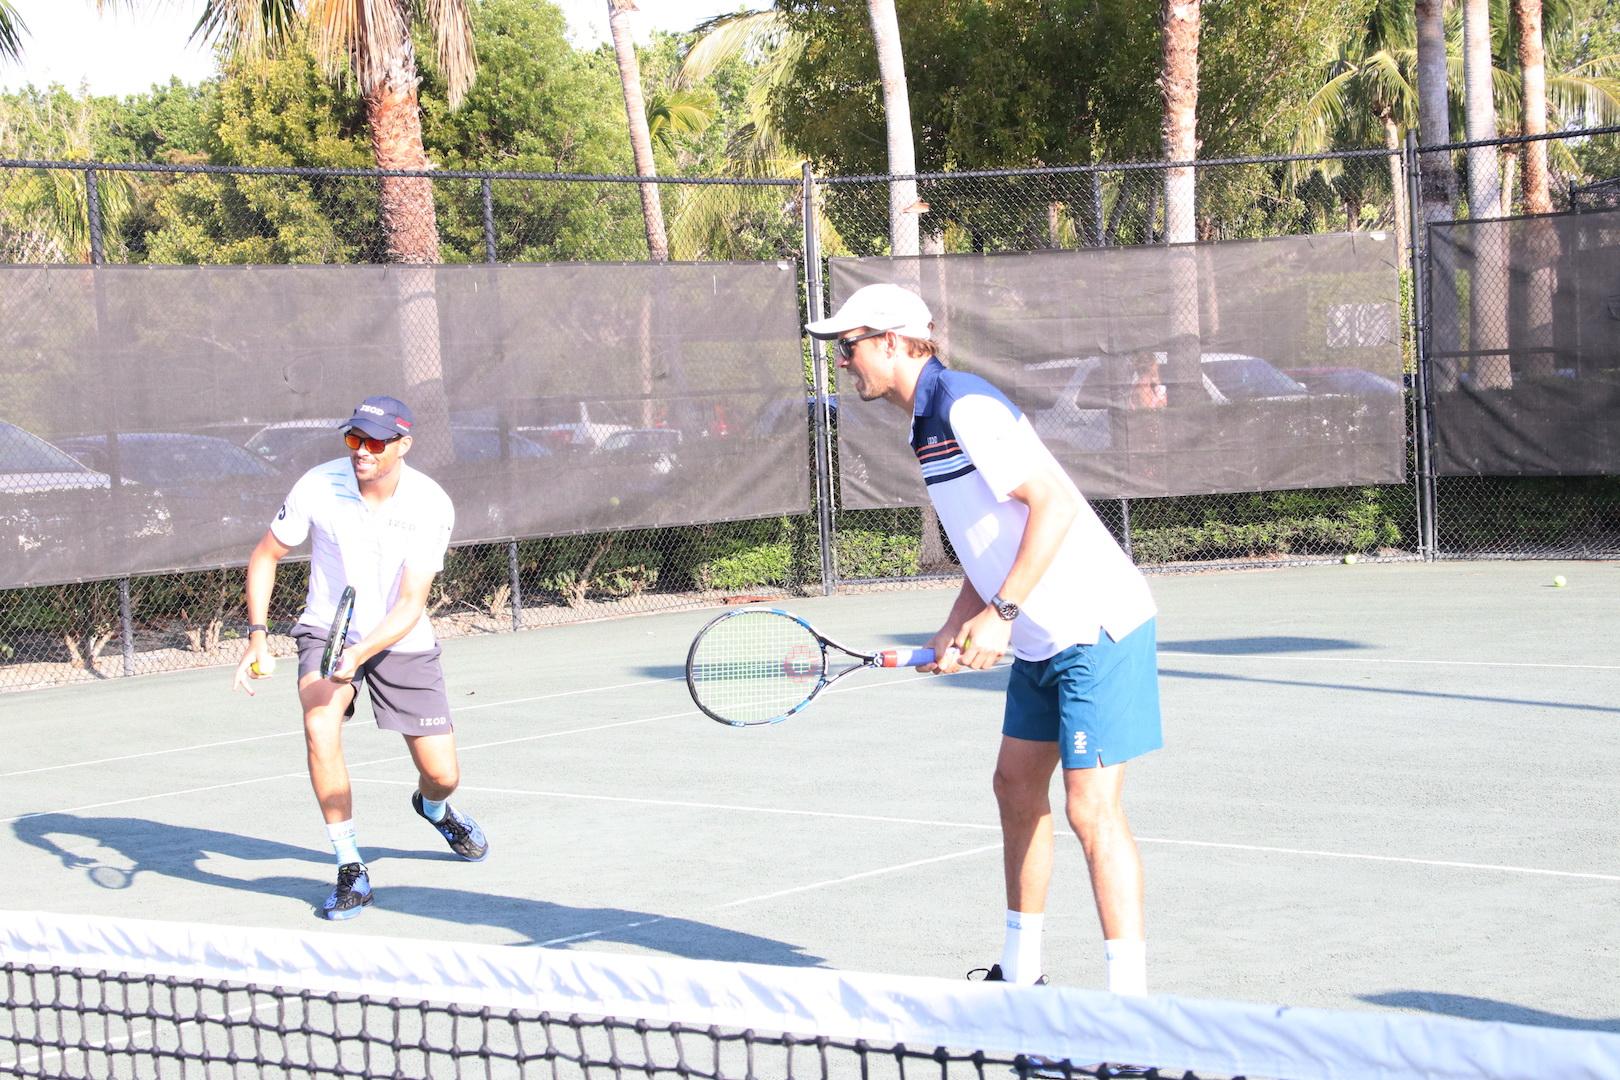 tennis-Bryans3.JPG